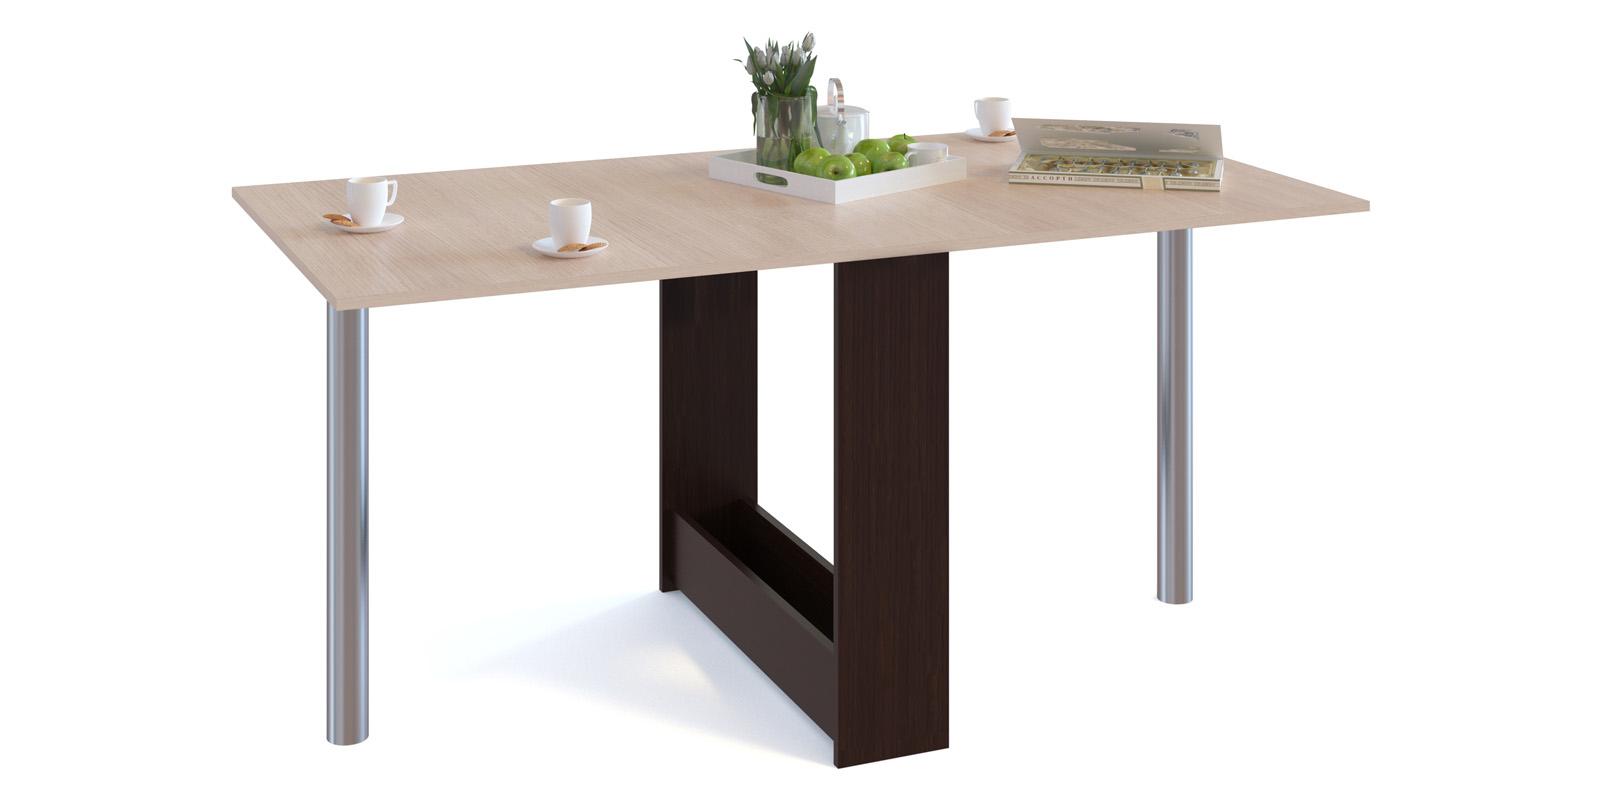 Обеденный стол Алмер (венге/беленый дуб)